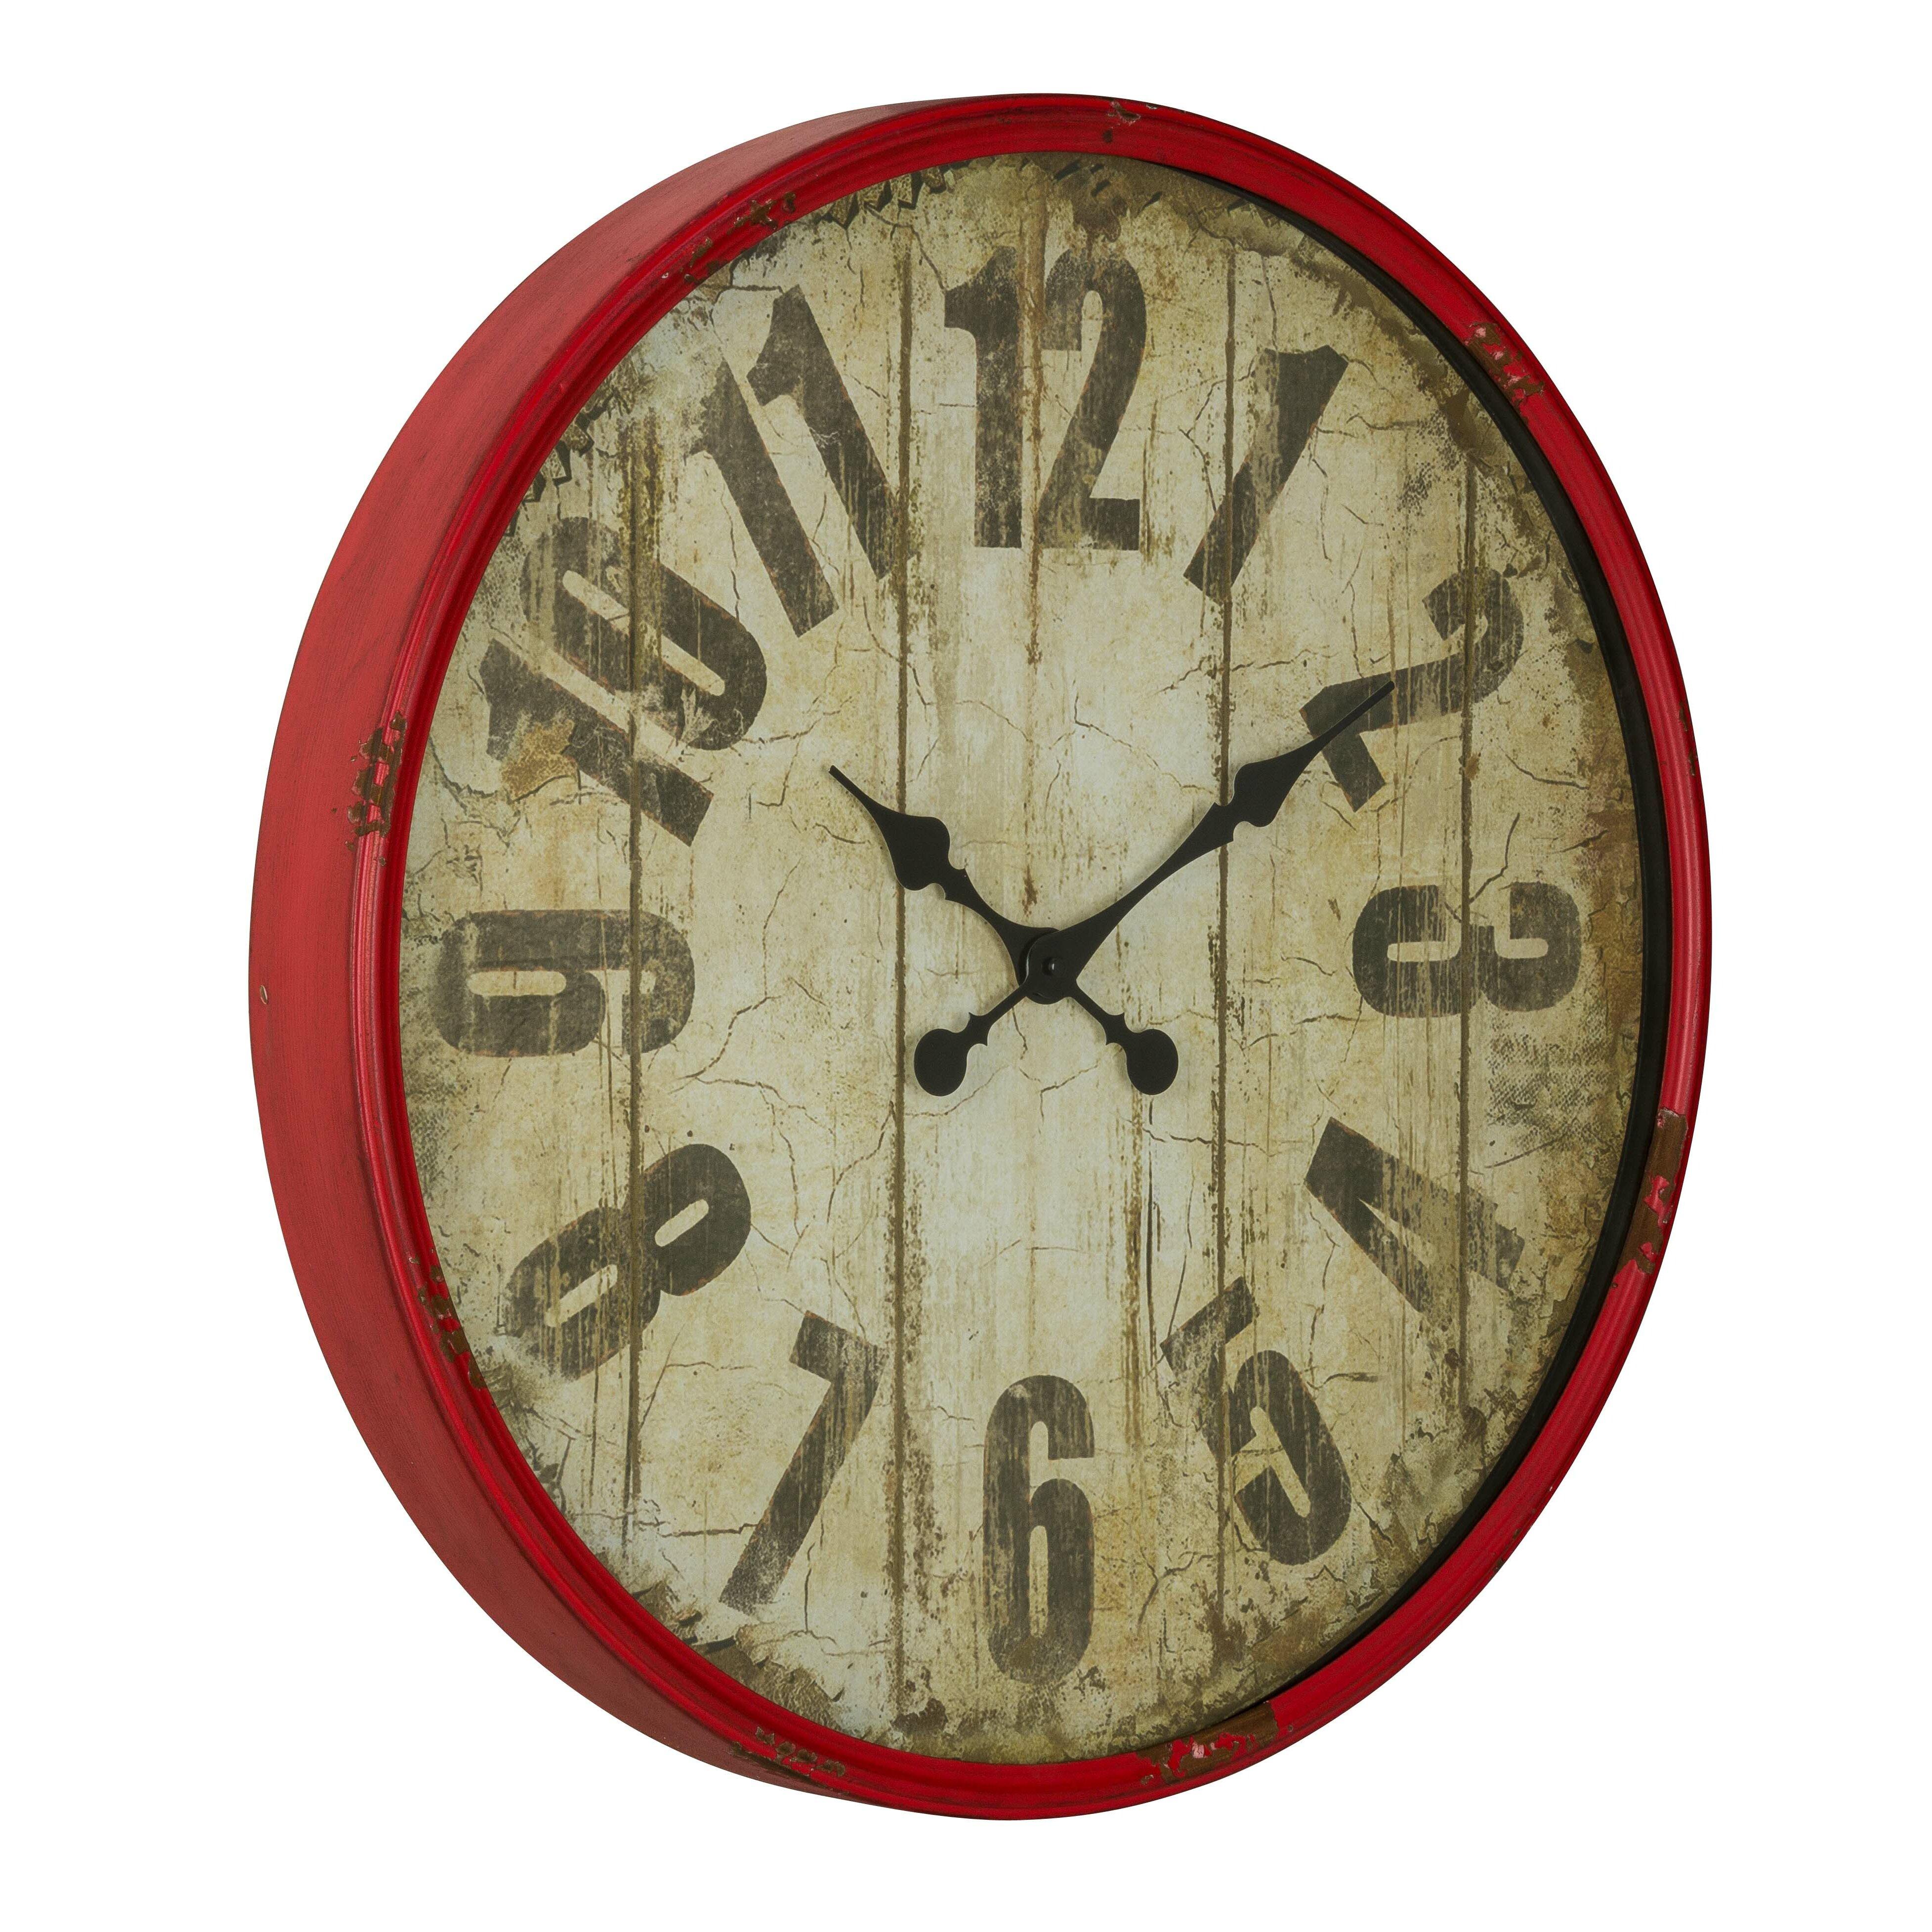 Bathroom clocks uk home design bathroom wall clocks uk jobs4education amipublicfo Images